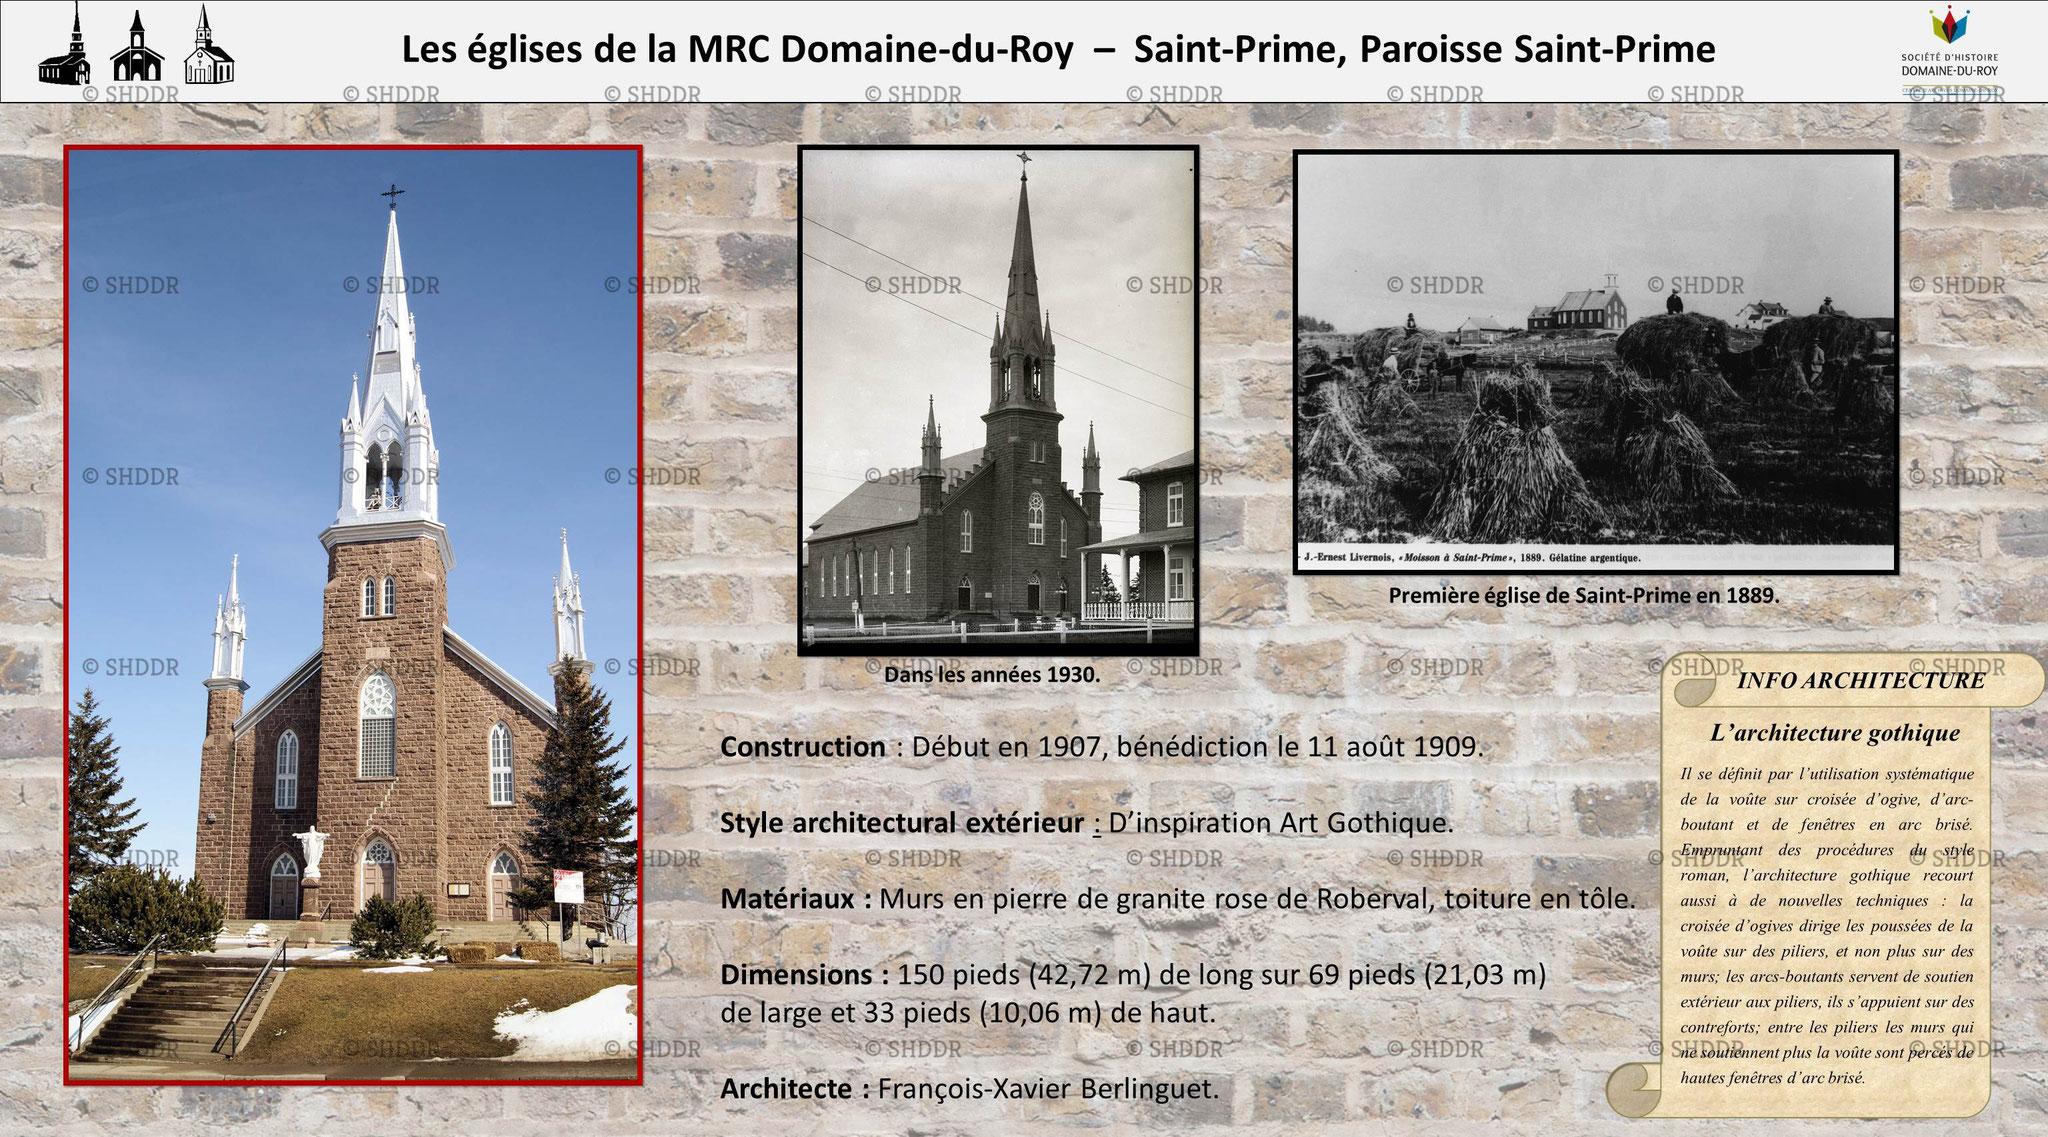 Saint-Prime - Paroisse Saint-Prime